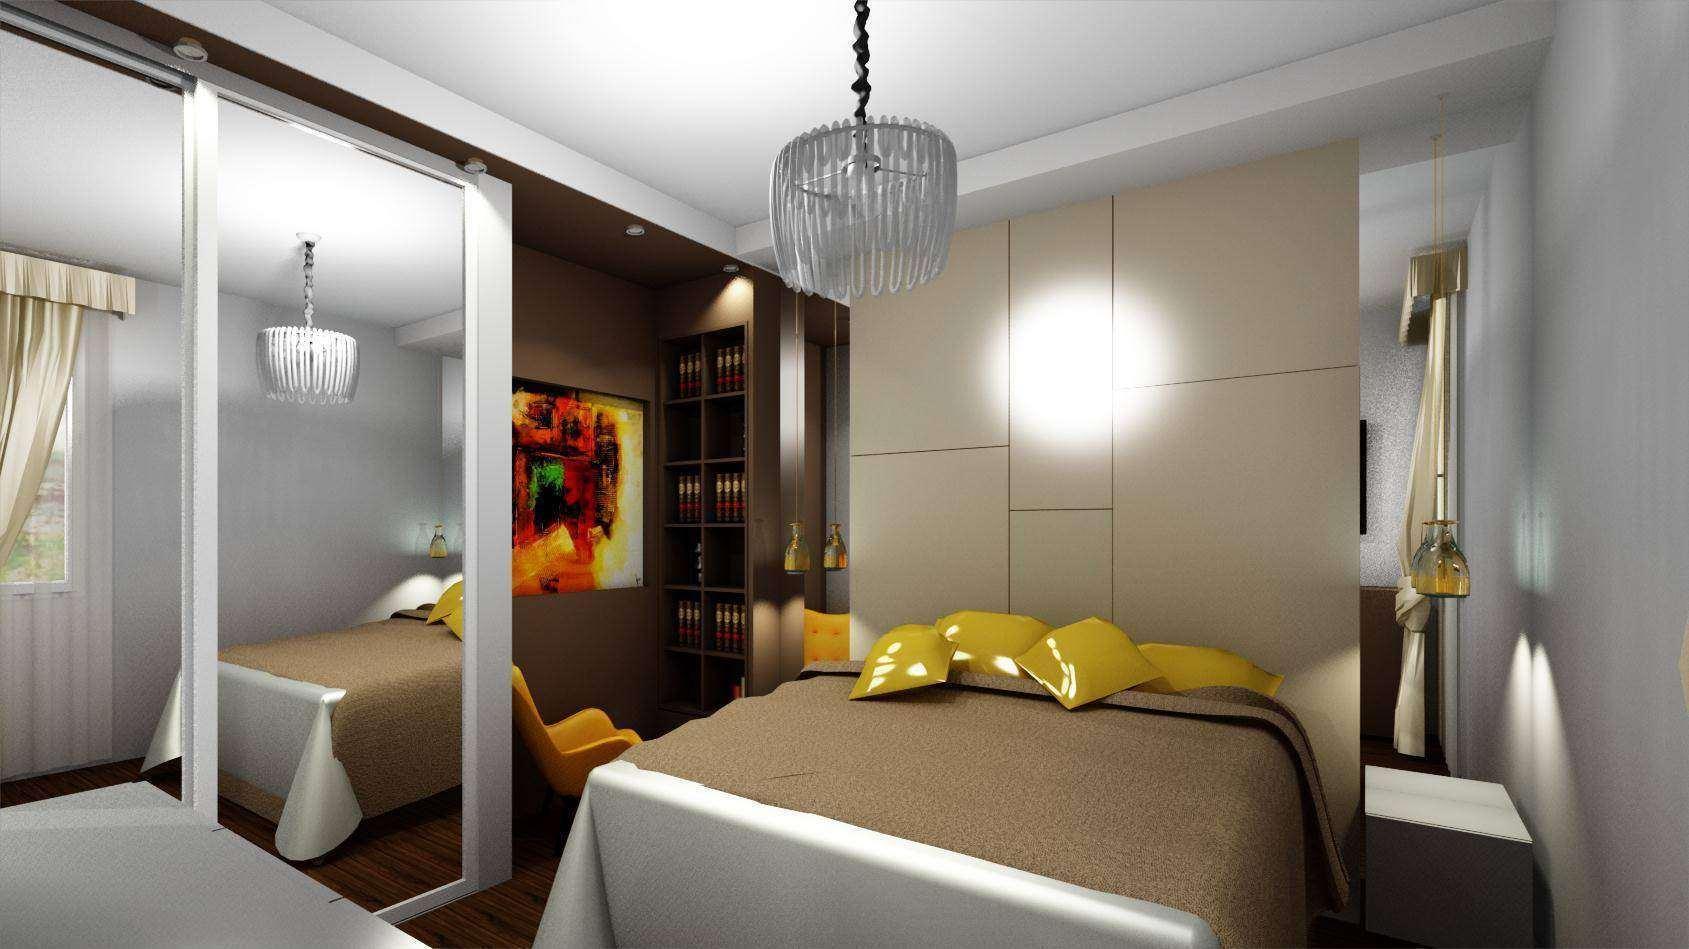 <a href=&quot;unican va pune la dispozitie solutii complete de design interior &quot;>Design interior apartament de vacanta<img src='http://www.unican.ro/wp-content/themes/vita/img/dreapta.png' class='pull-right hidden-xs' style='margin-right:-10px;margin-top:-10px; max-height:41px'></a>